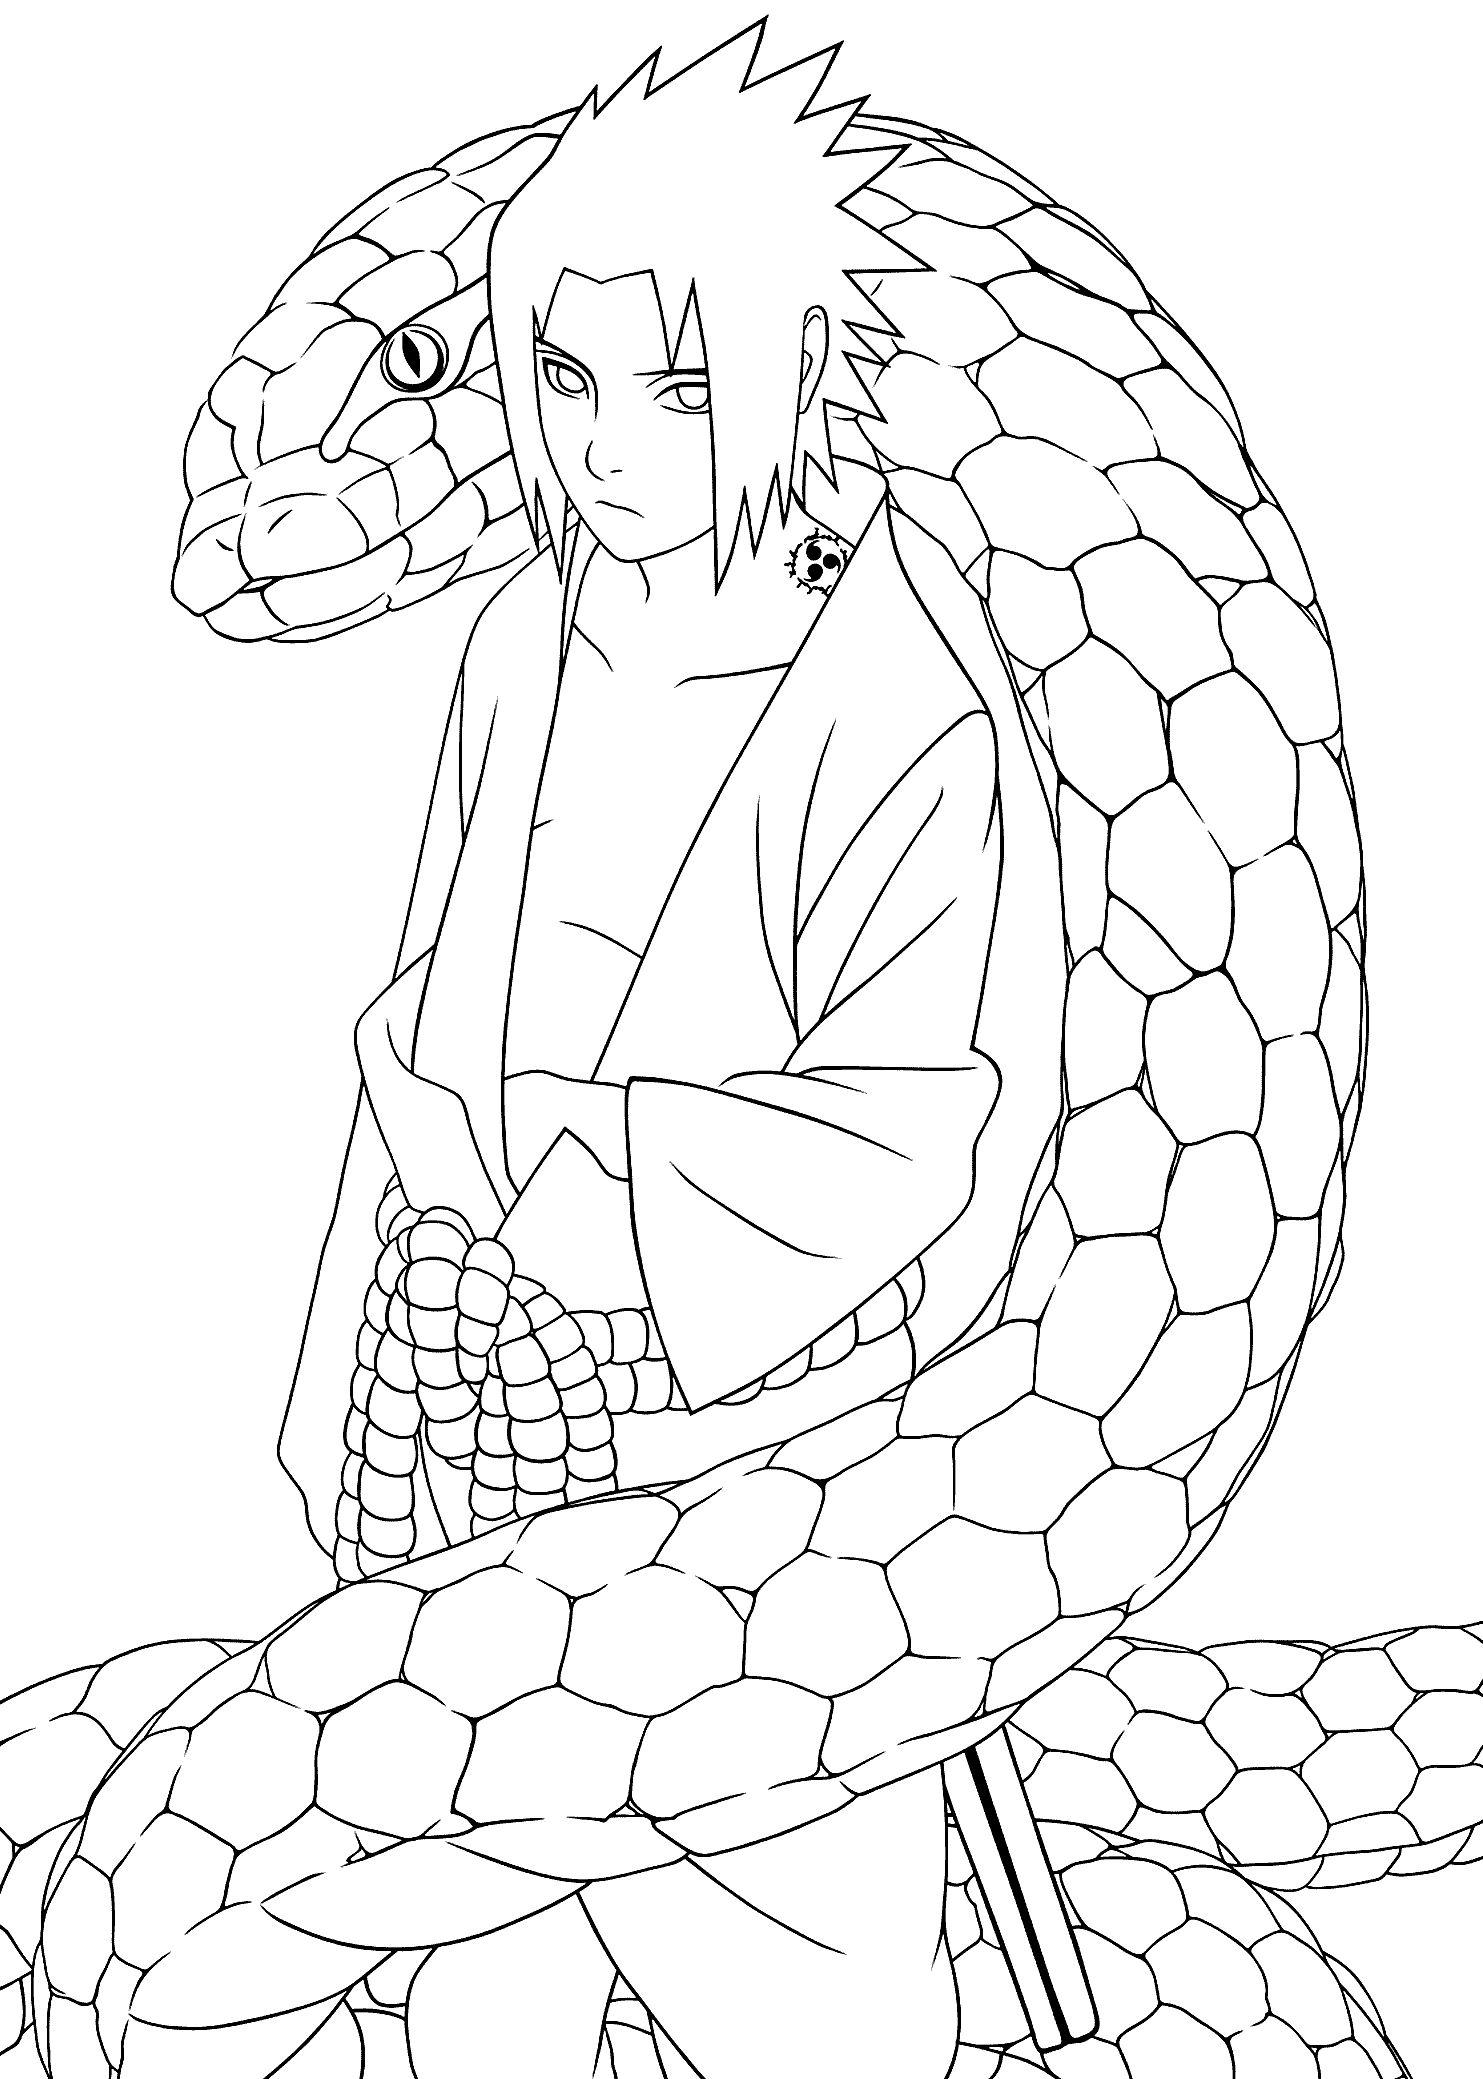 Akatsuki Coloring Pages Printable Avec Images Coloriage Naruto